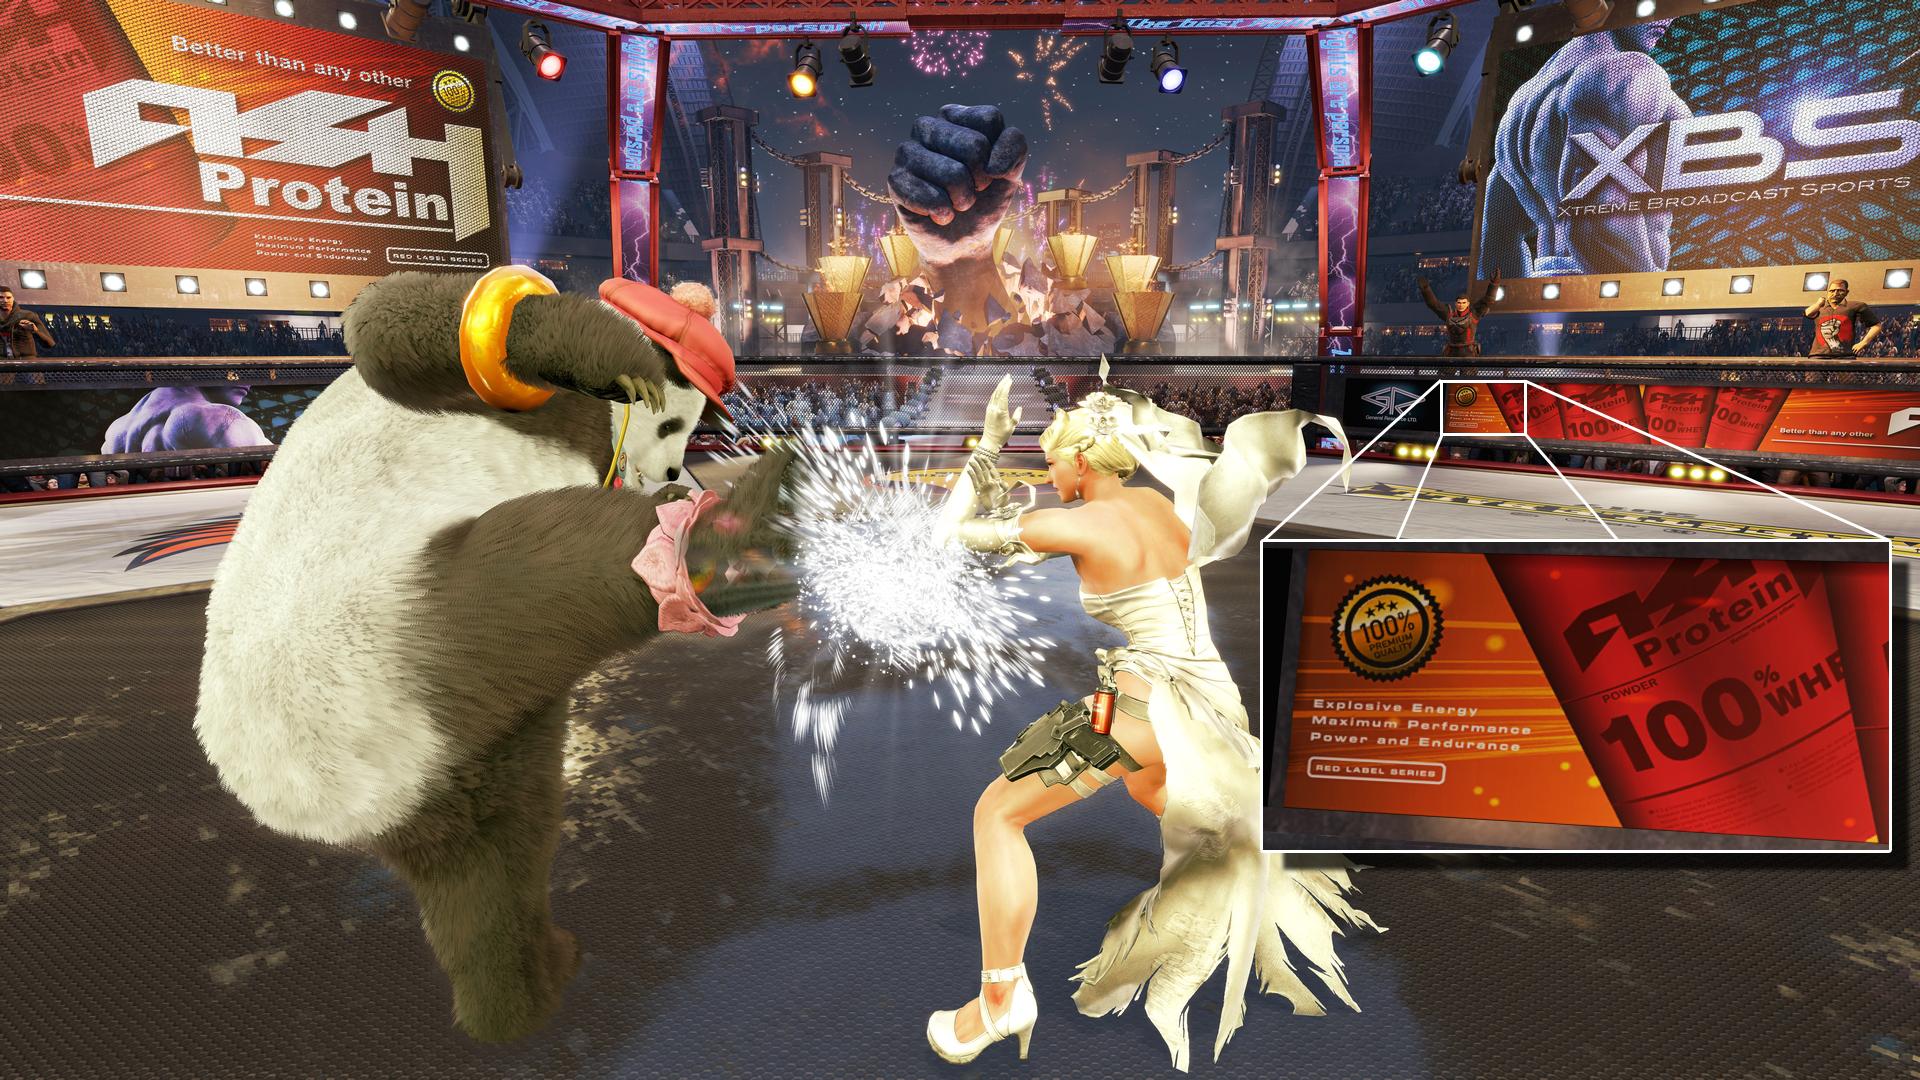 Tekken 7: Now With NVIDIA Ansel